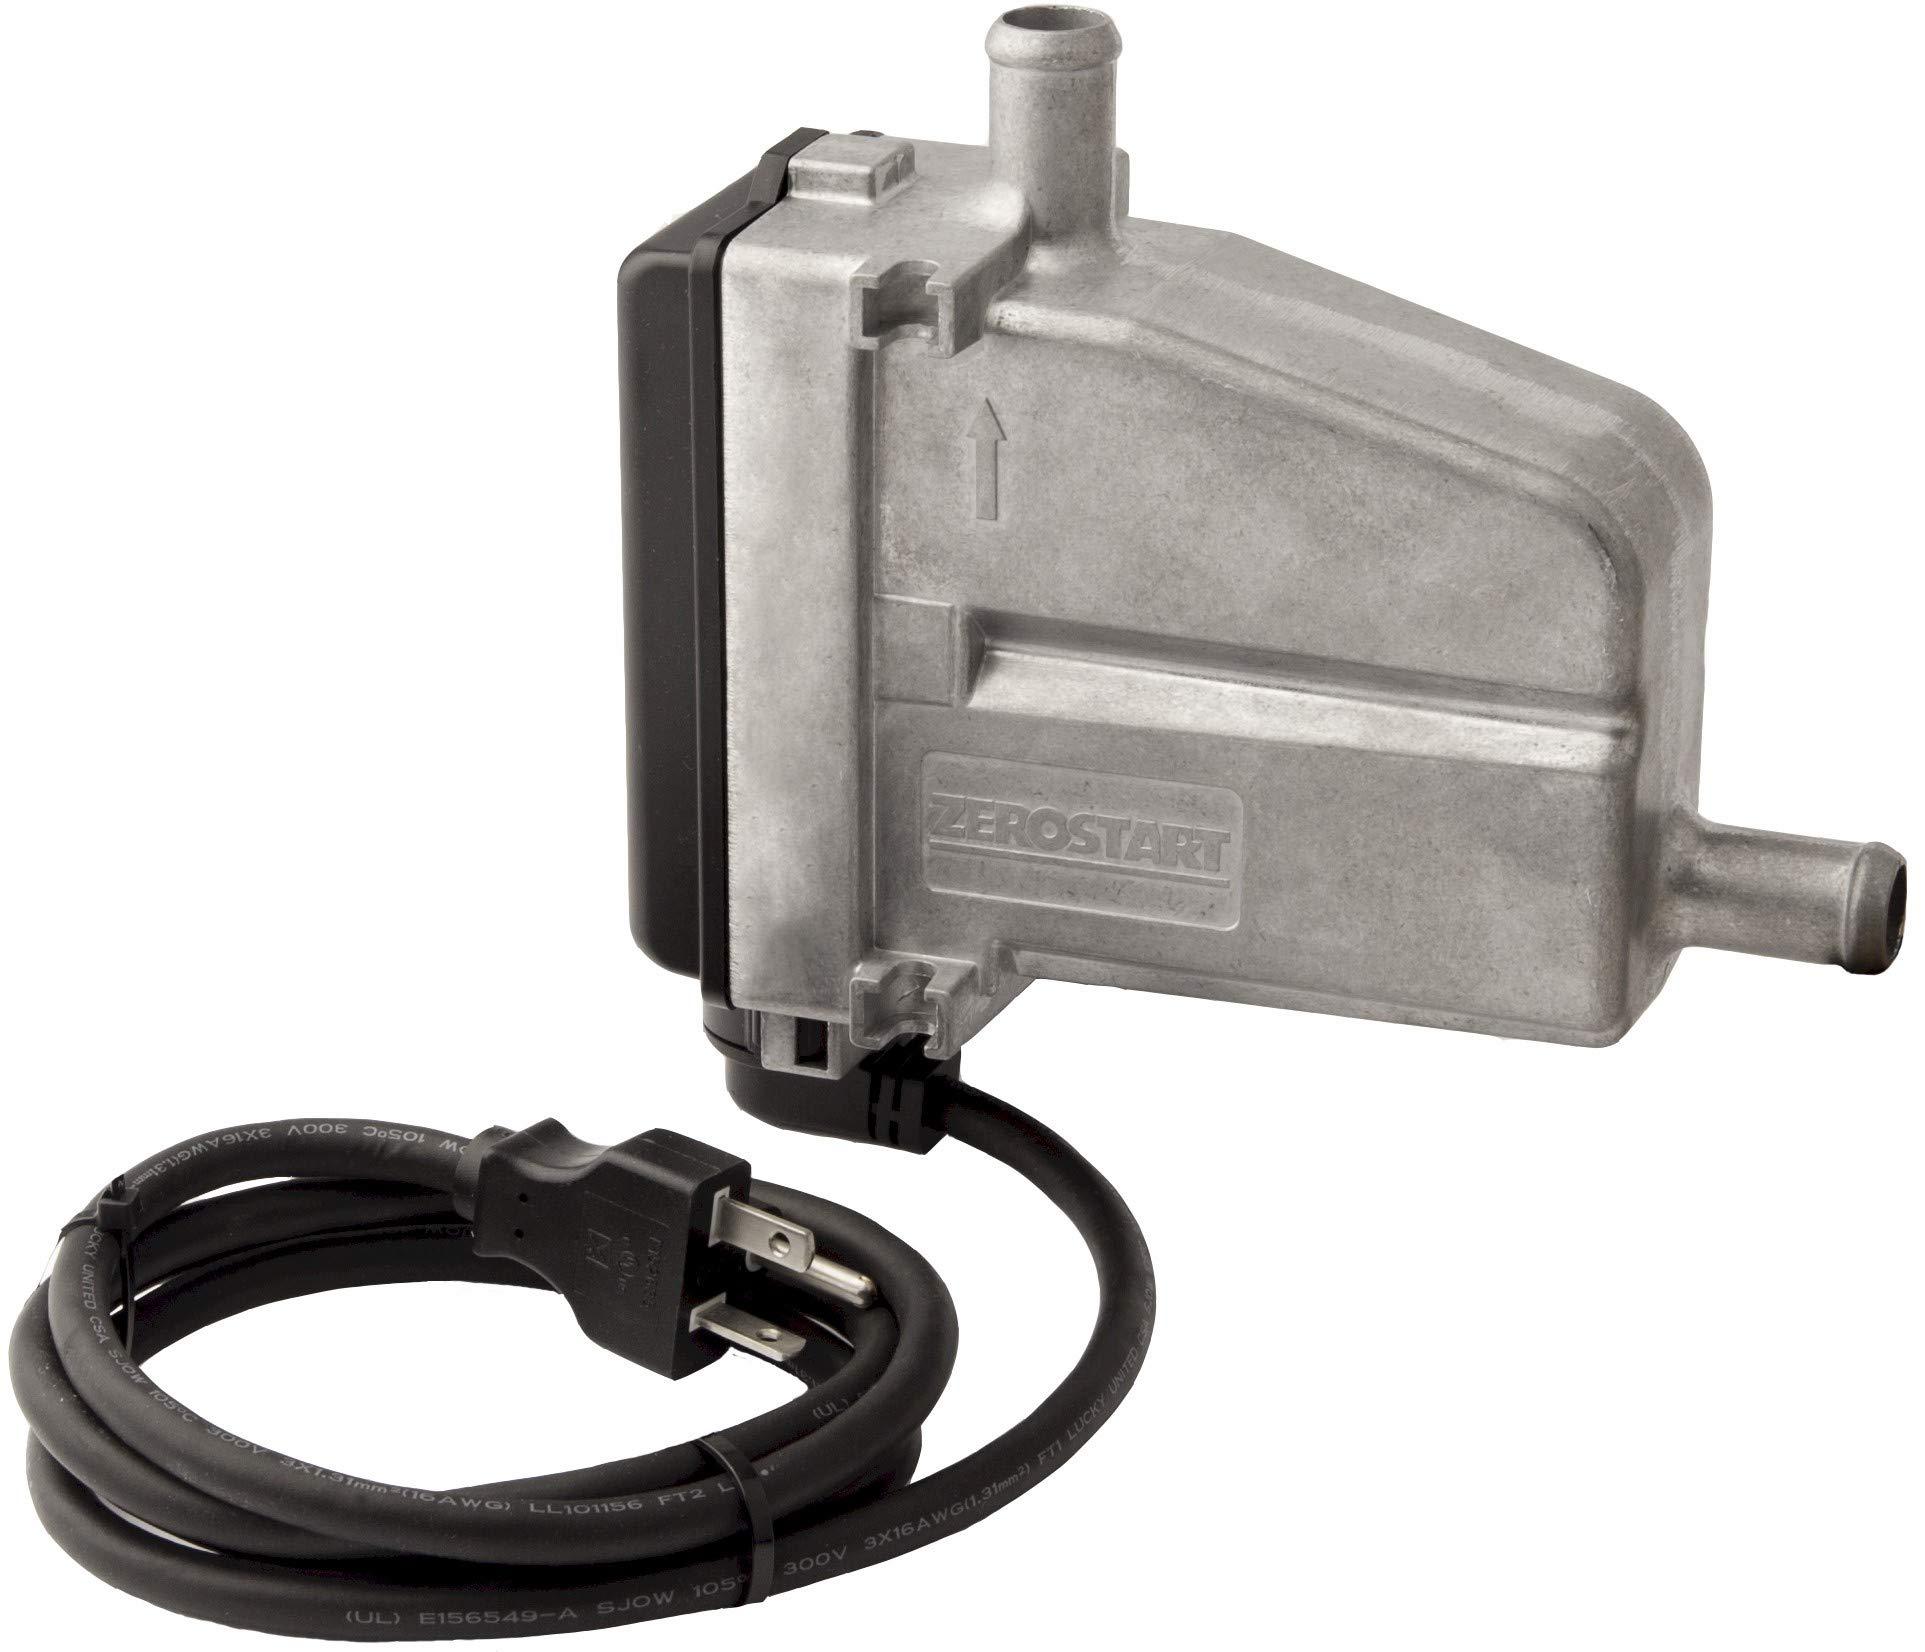 Zerostart 350-0020 Engine Block Heater